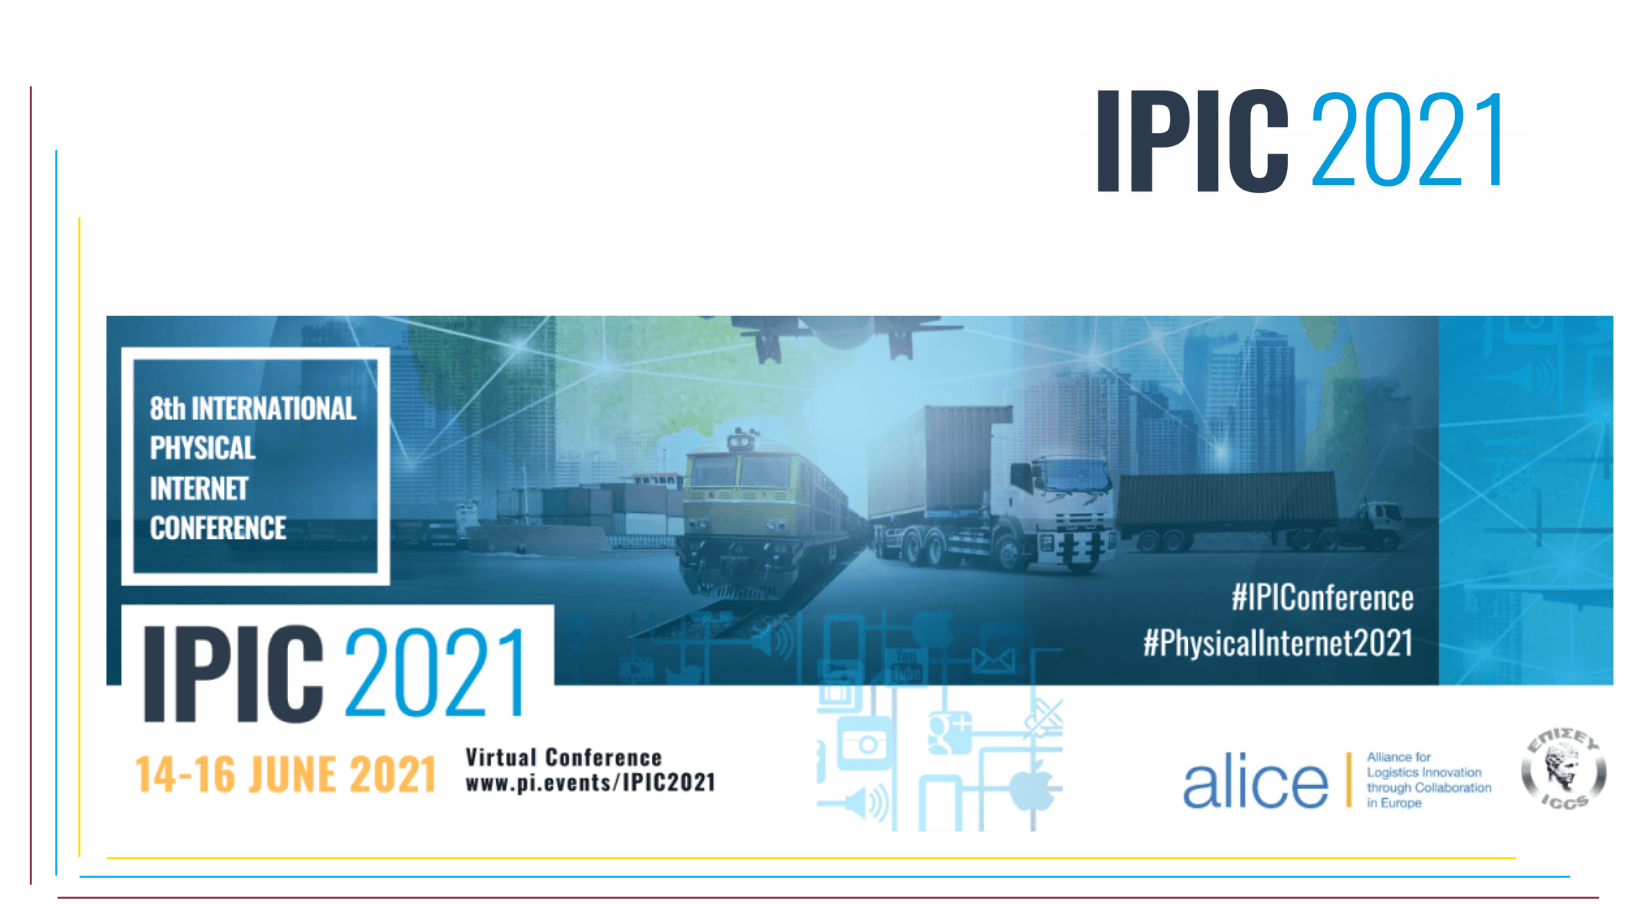 "Una Sessione Speciale sul ""Curb Side Management in the Physical Internet"" all'IPIC 2021 : Paola Cossu, CEO di FIT Consulting, moderator e speaker dell'8° Conferenza Internazionale sulla Physical Internet"